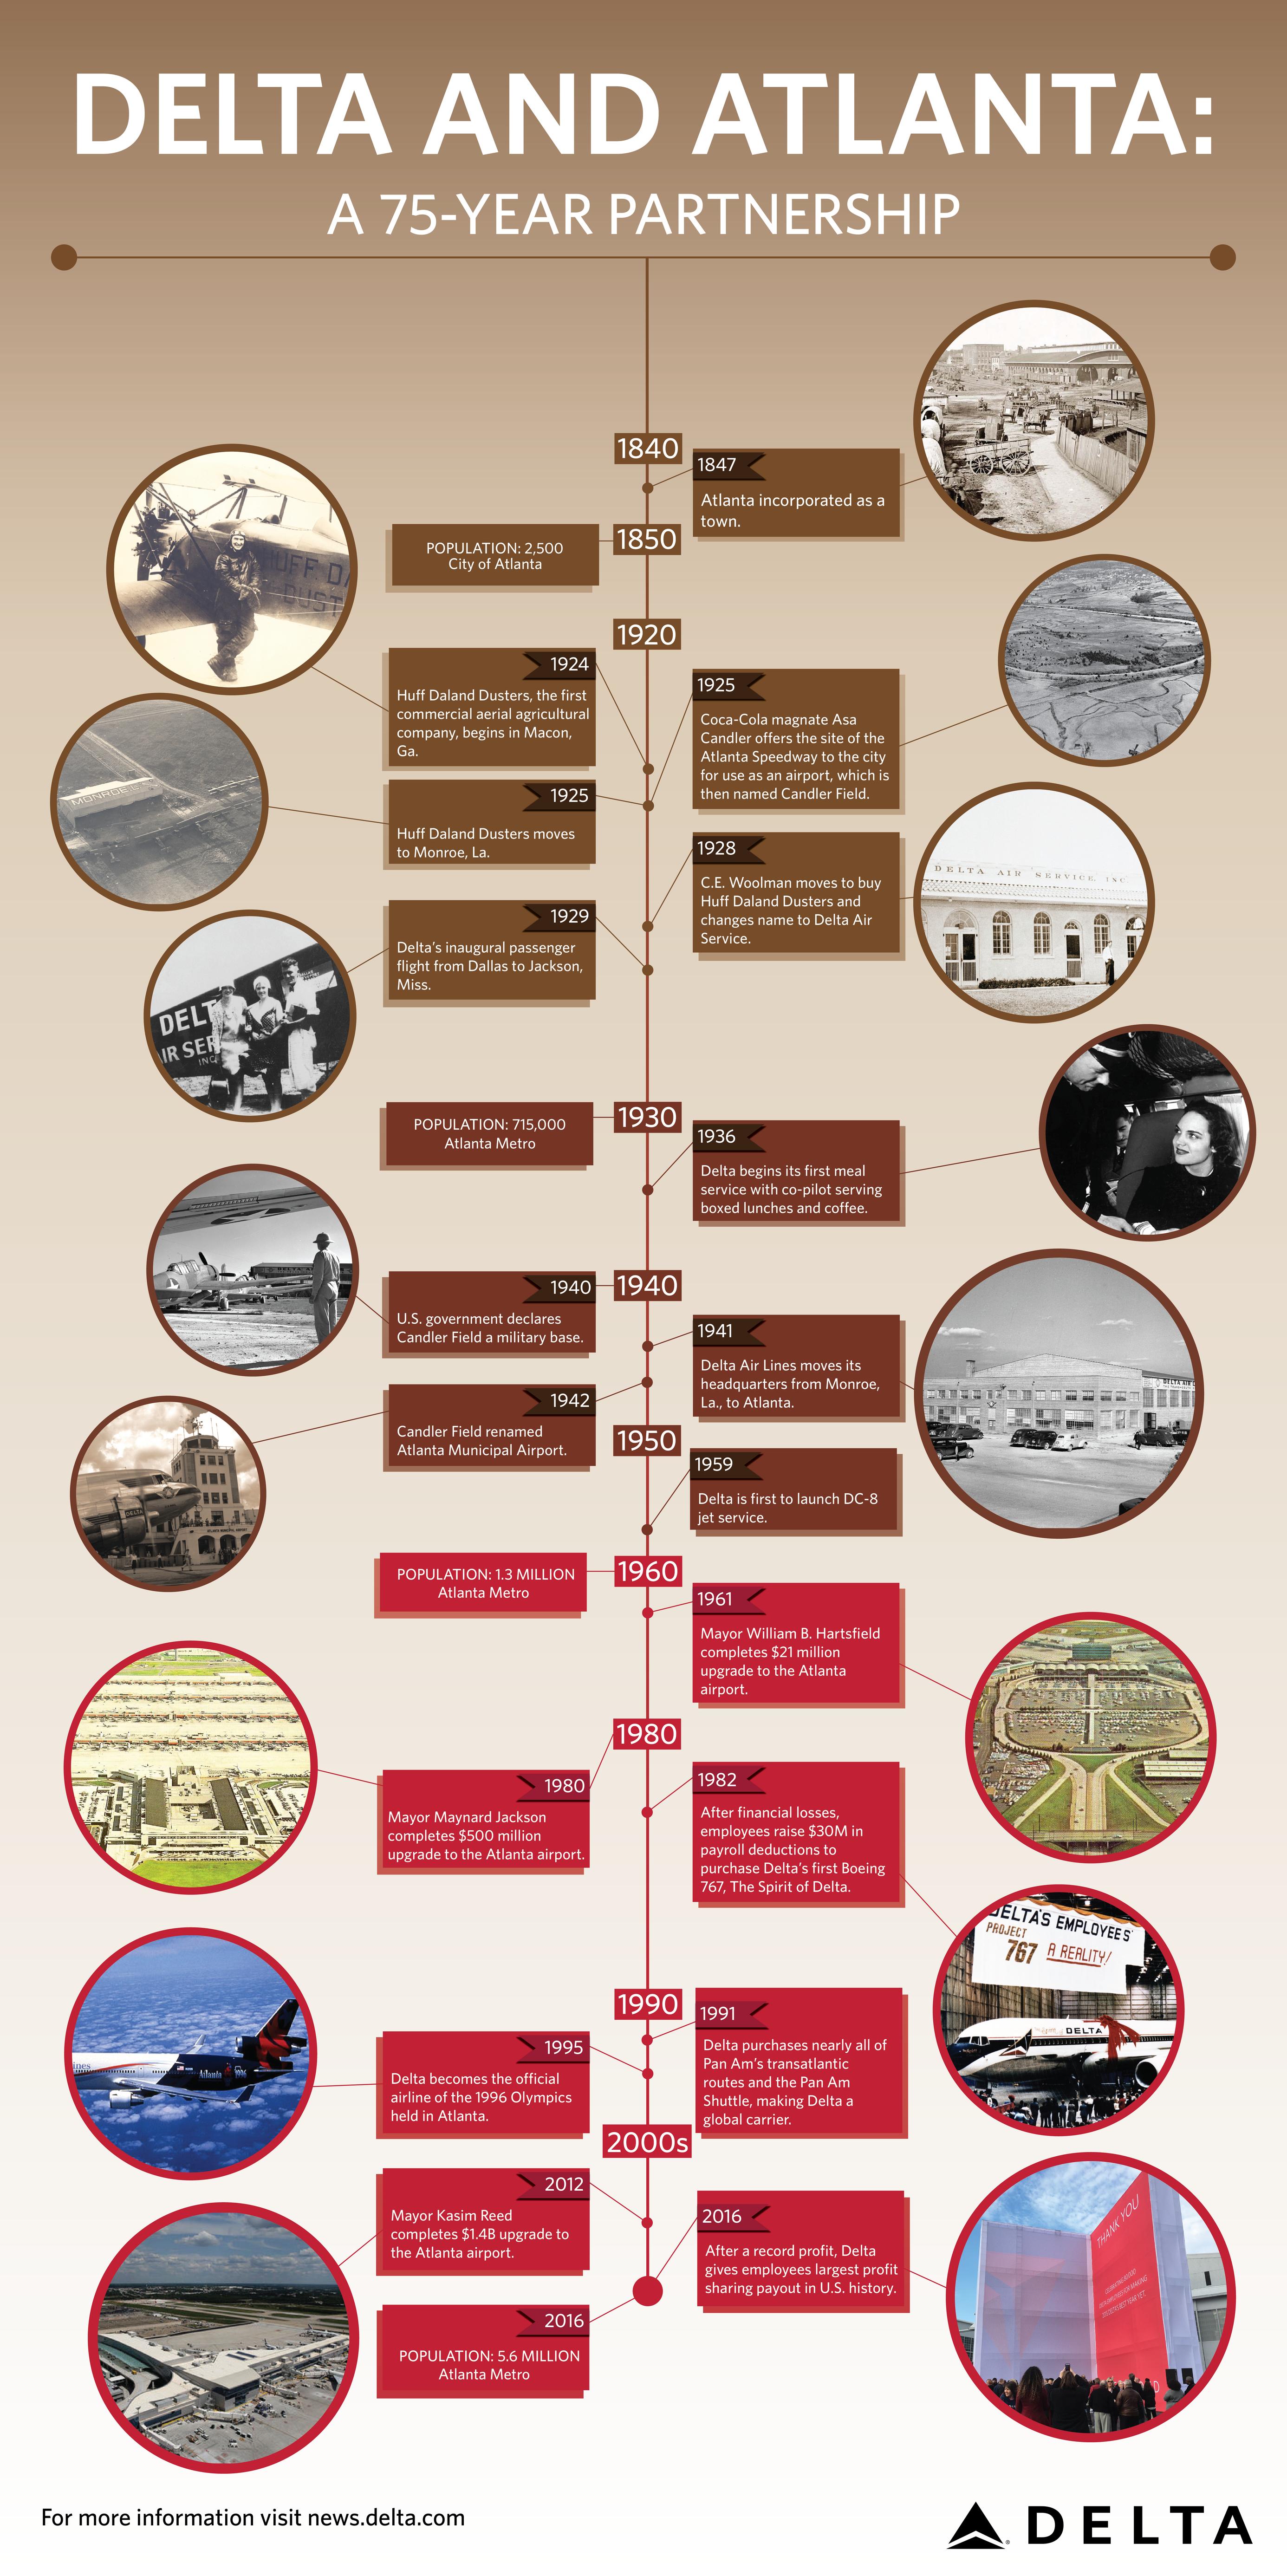 Delta and Atlanta: A 75-year partnership